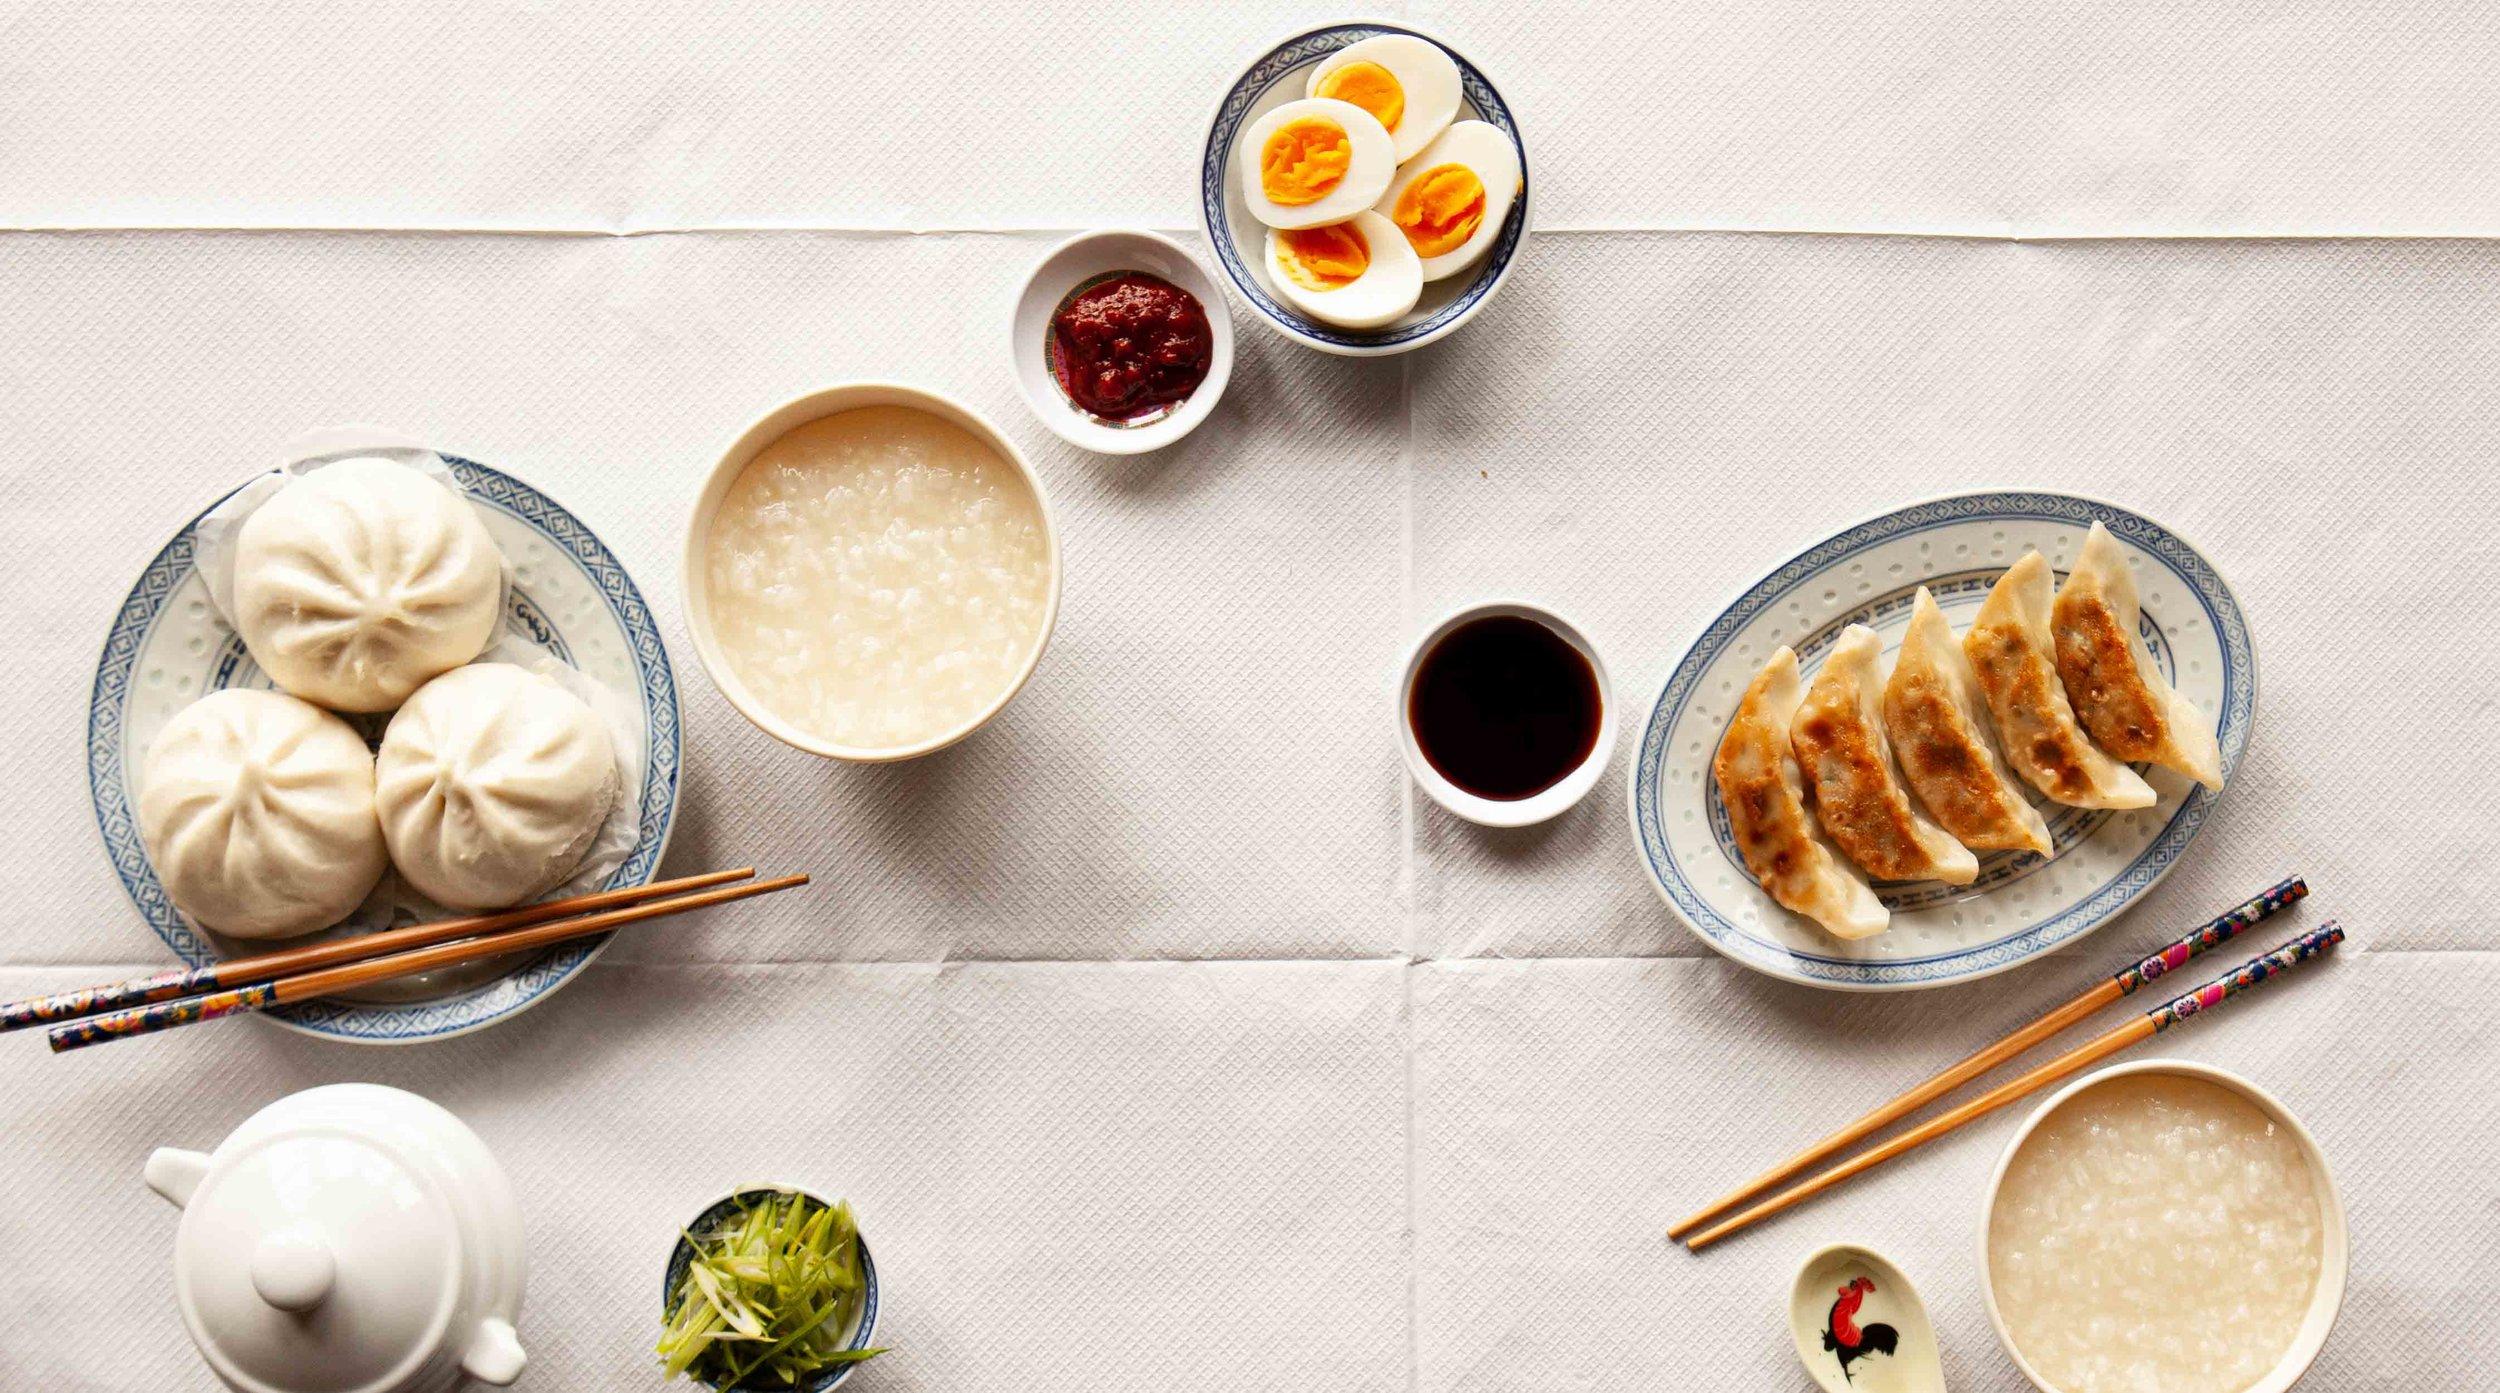 Chinese_breakfast-3362.jpg